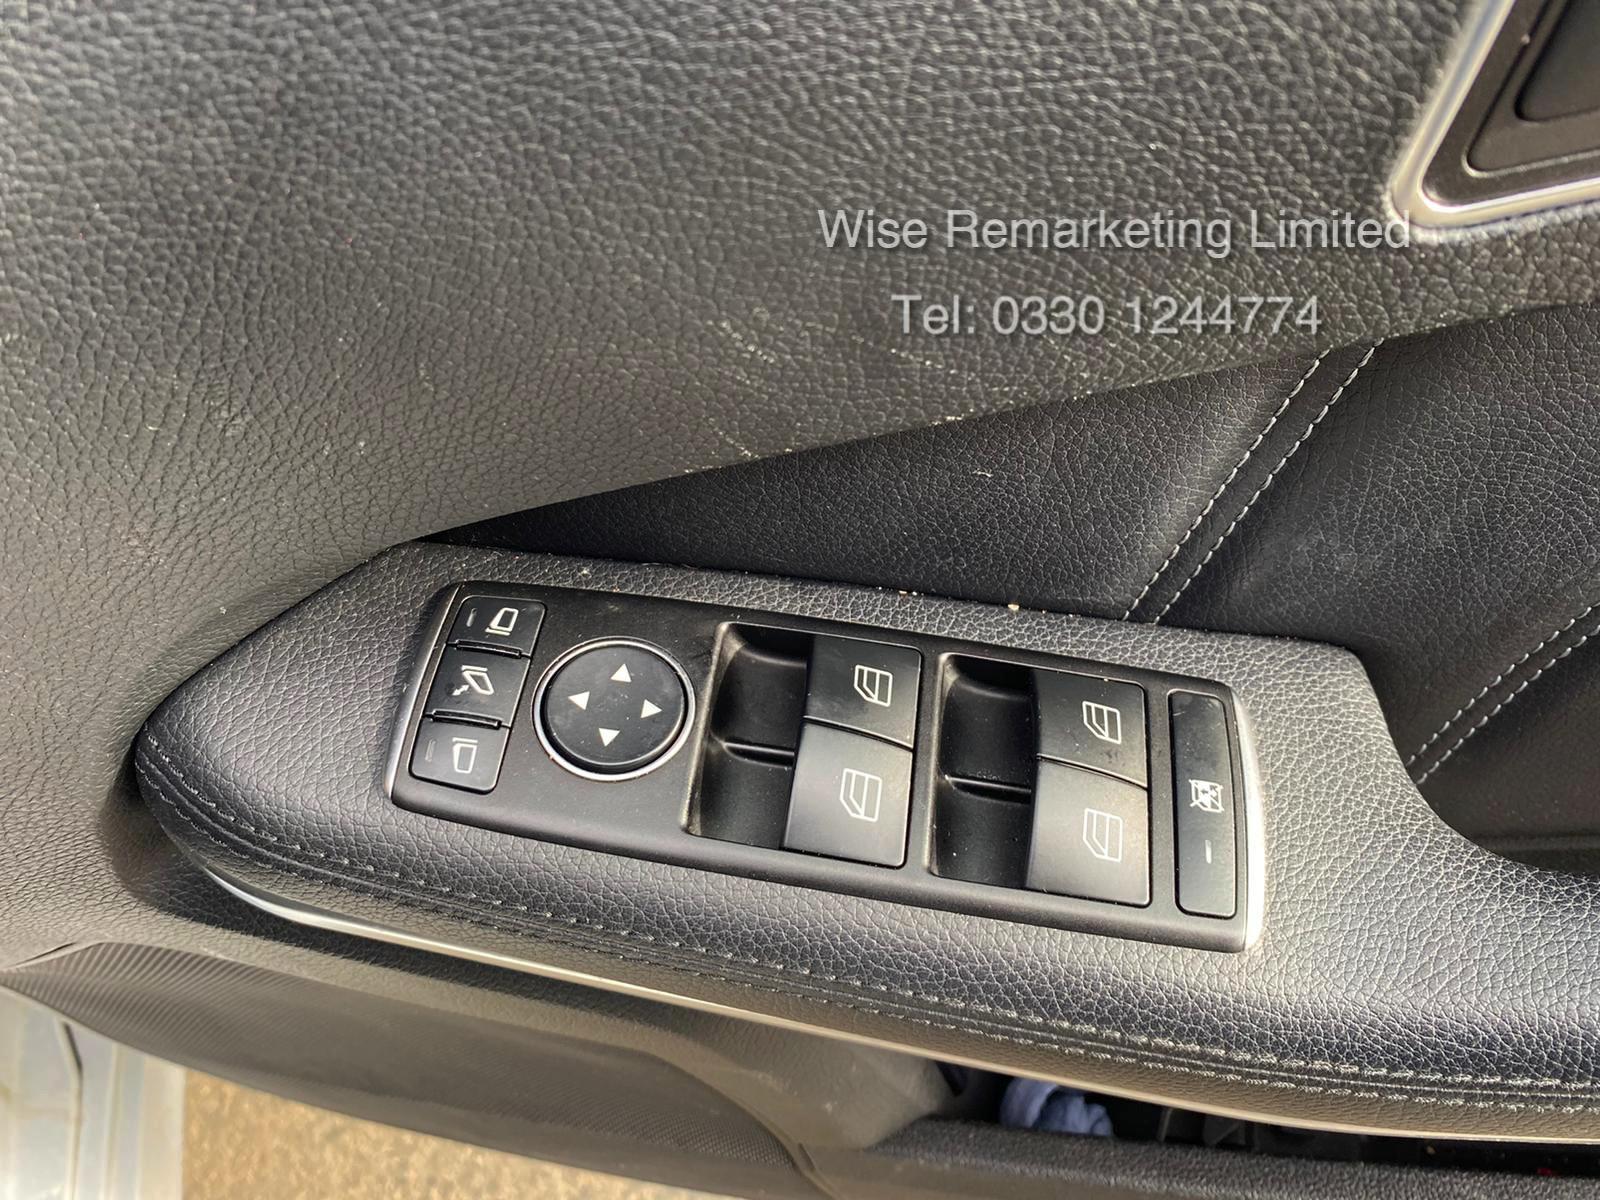 Mercedes E220d 2.1 Special Equipment Auto 2015 15 Reg - 1 Former Keeper - Sat Nav - Parking Sensors - Image 13 of 14